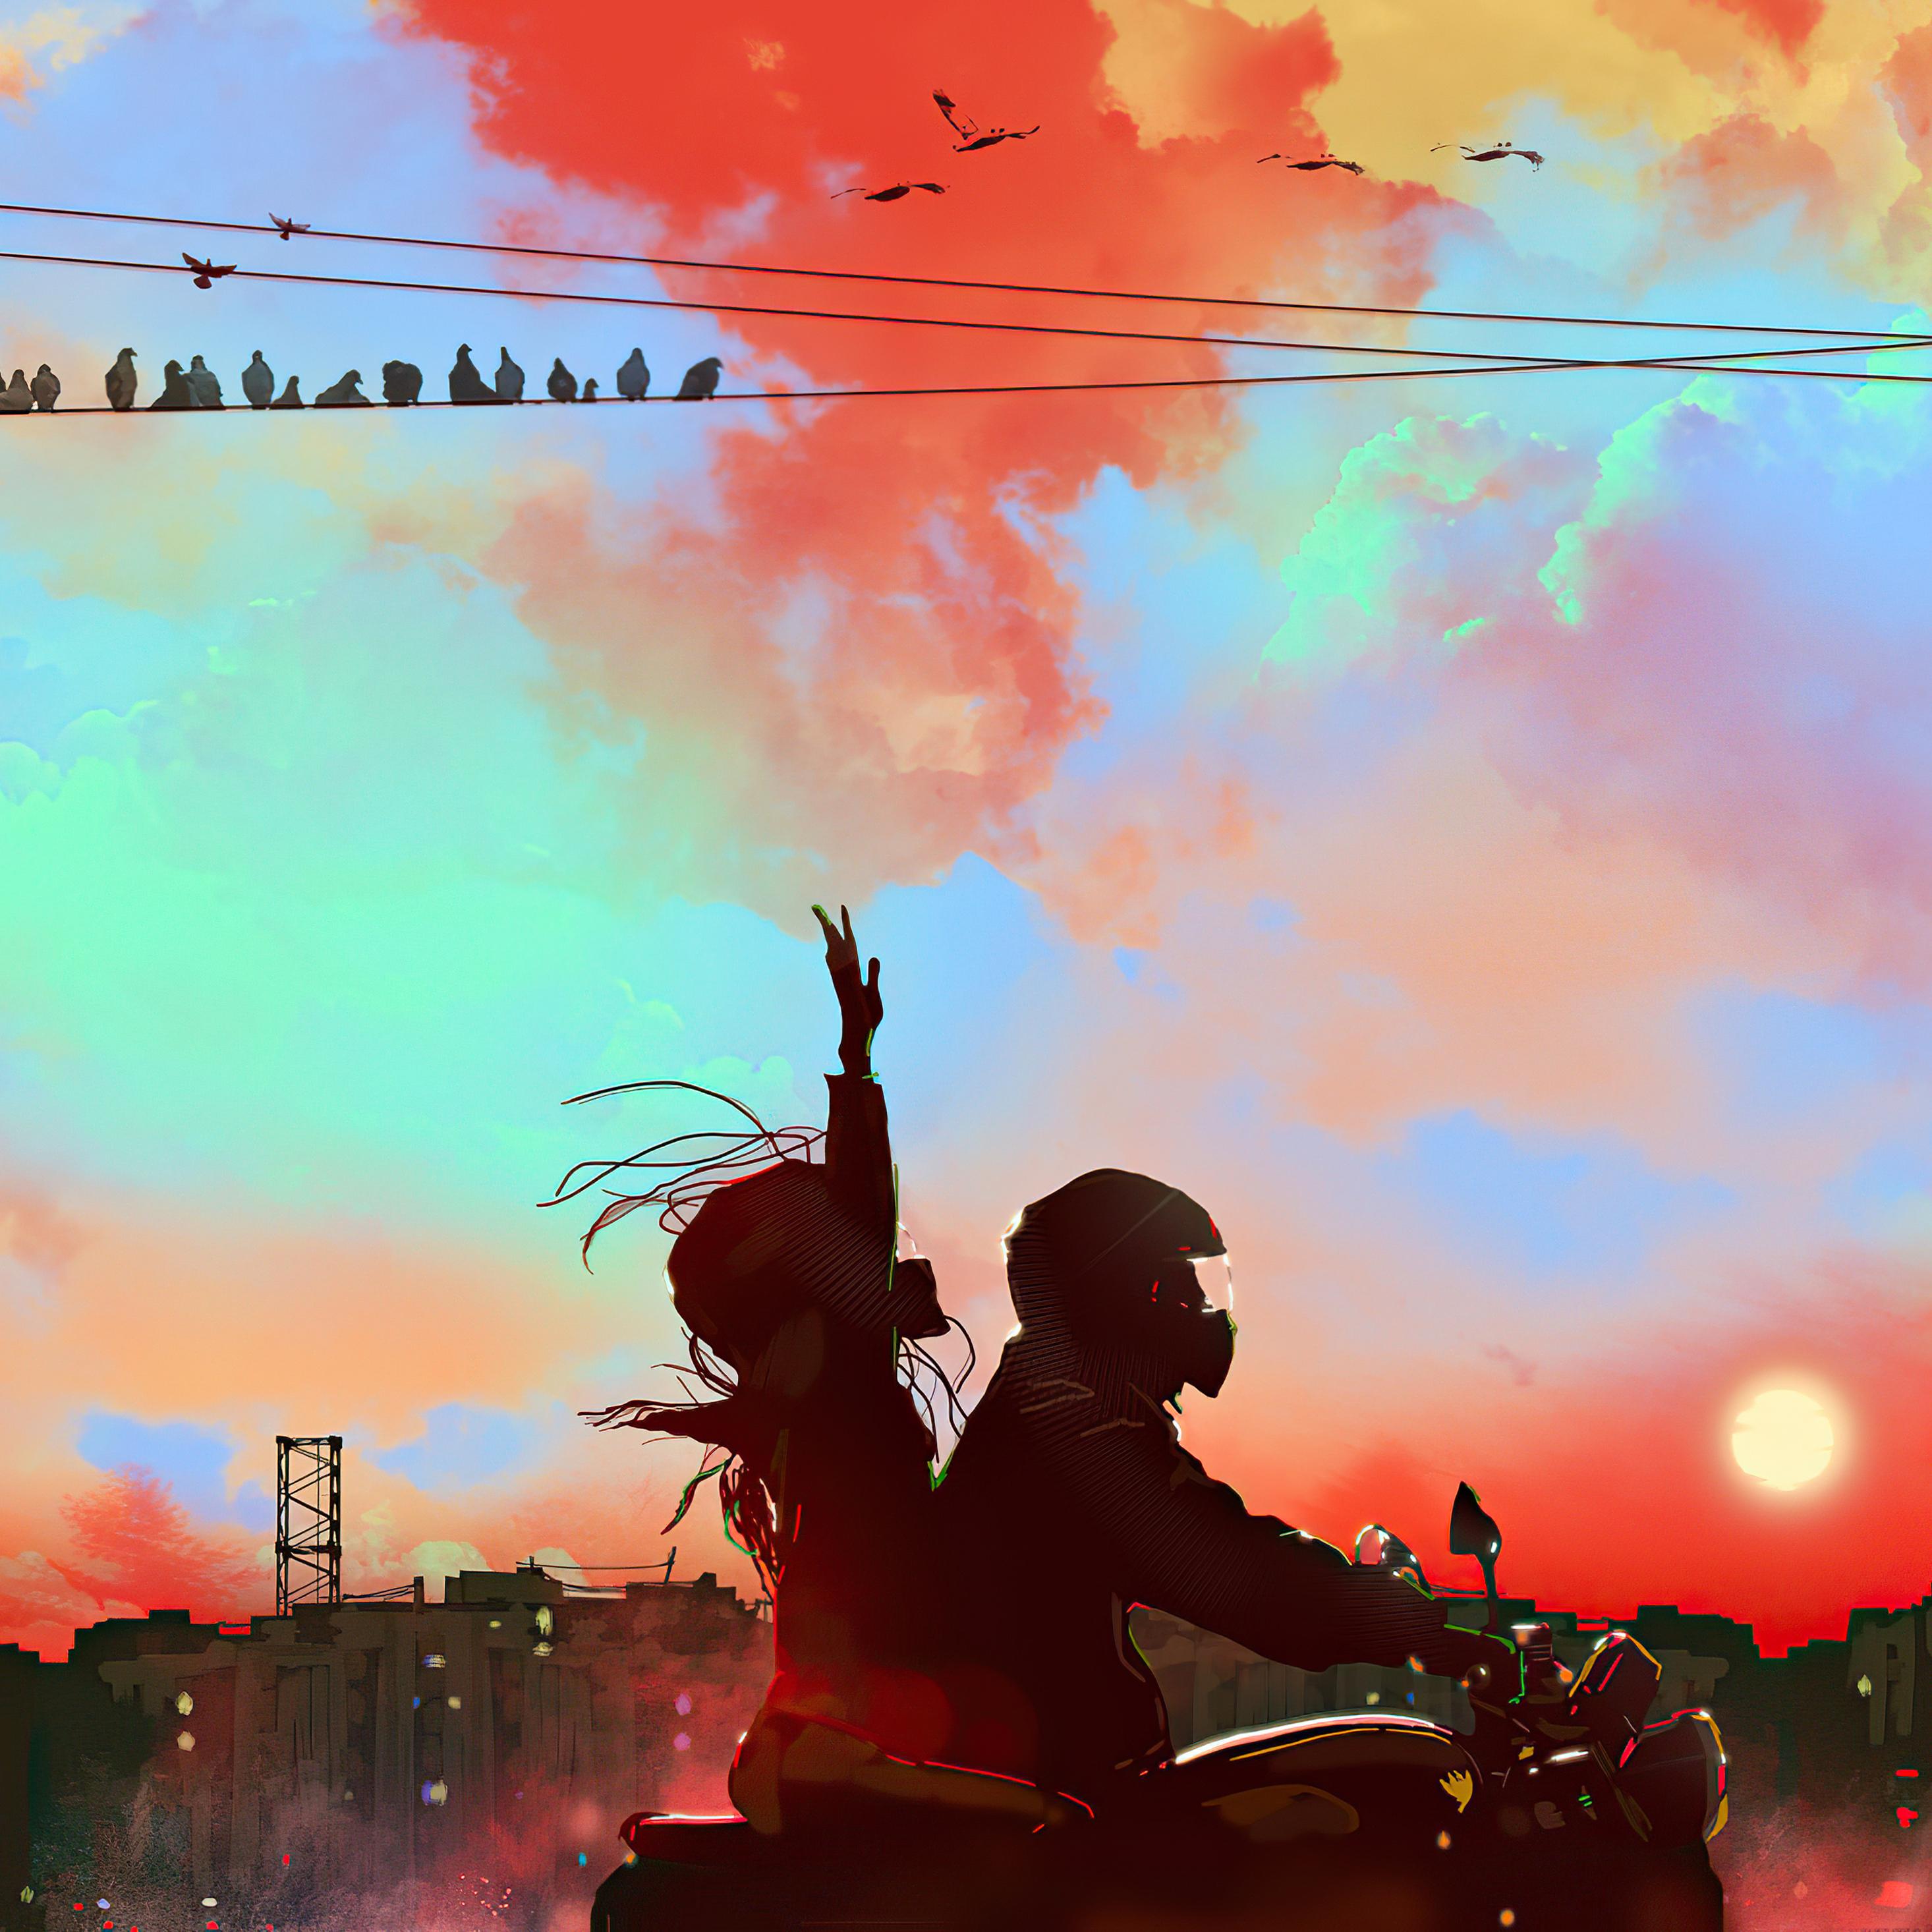 lover-bike-ride-evening-5k-r8.jpg